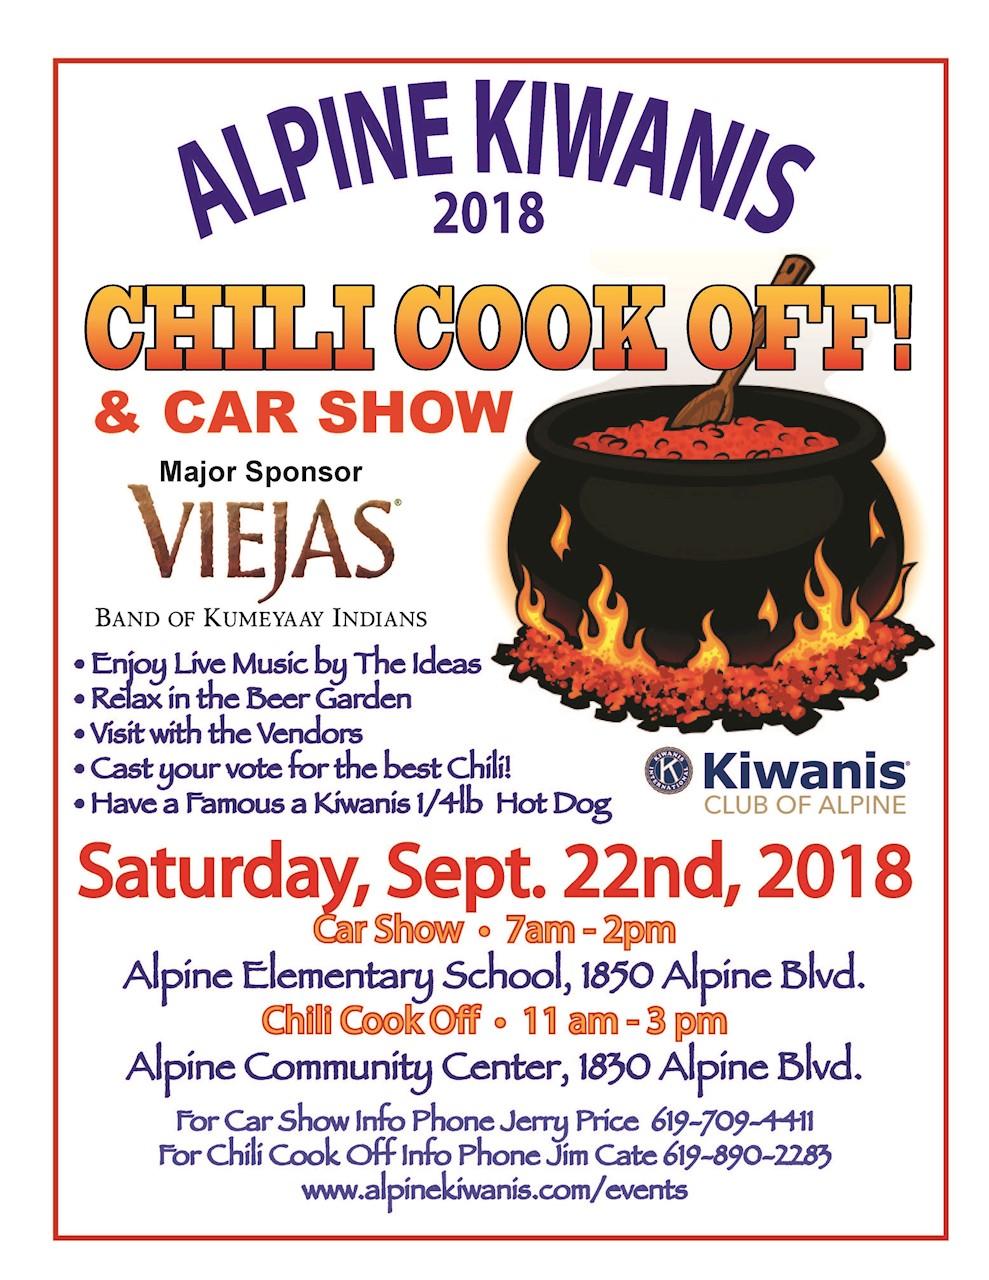 Kiwanis-Chili-Cook-Off-Sept.-22nd.jpg